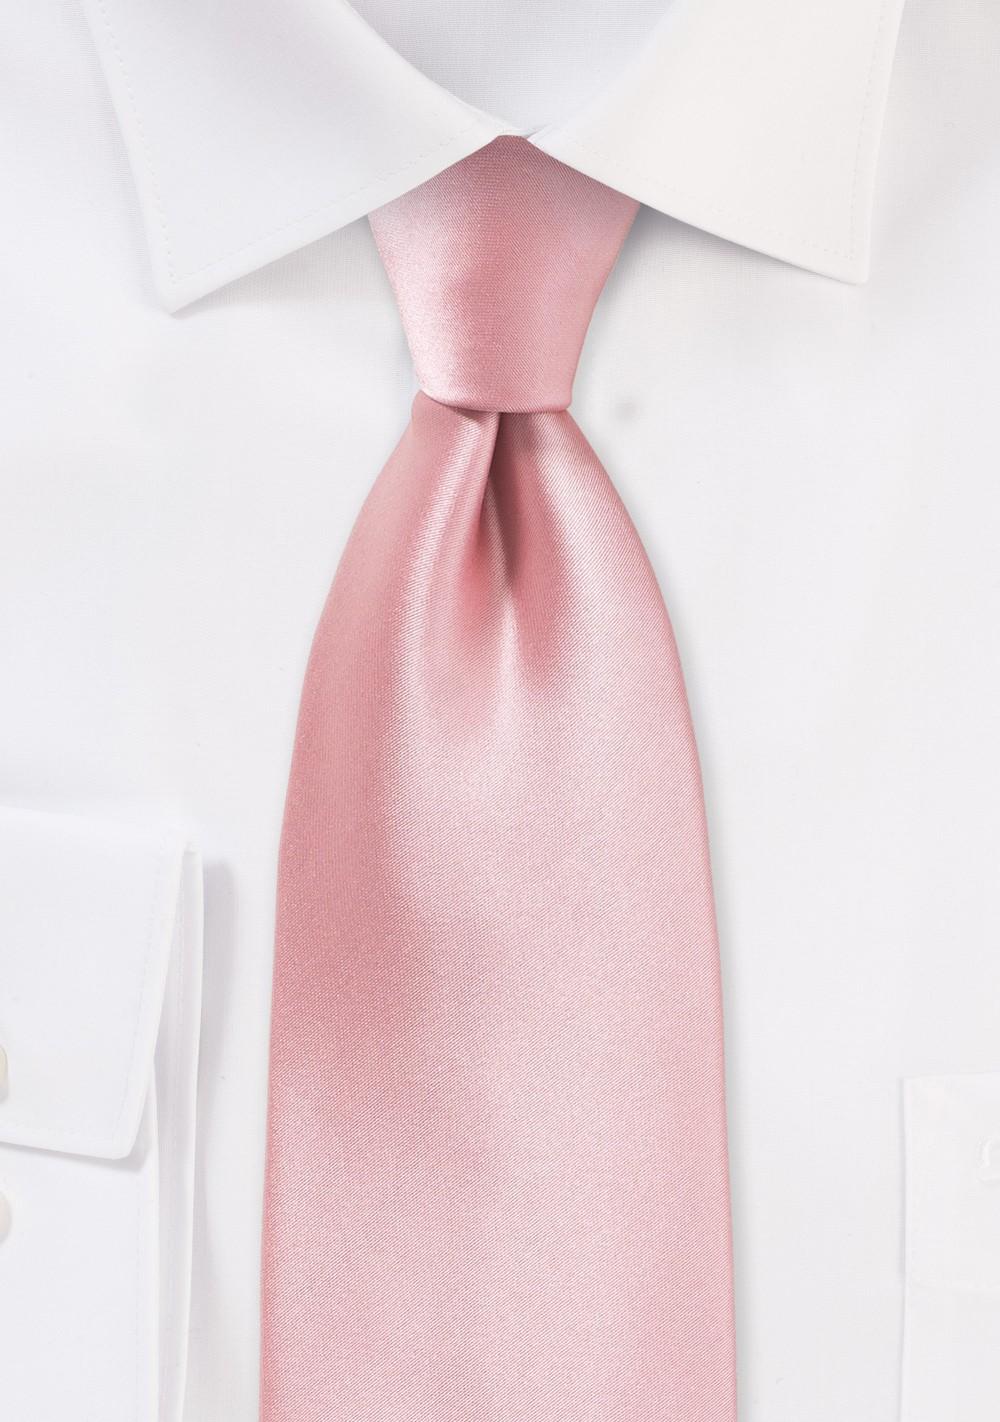 Petal Pink Hued Tie for Tall Men